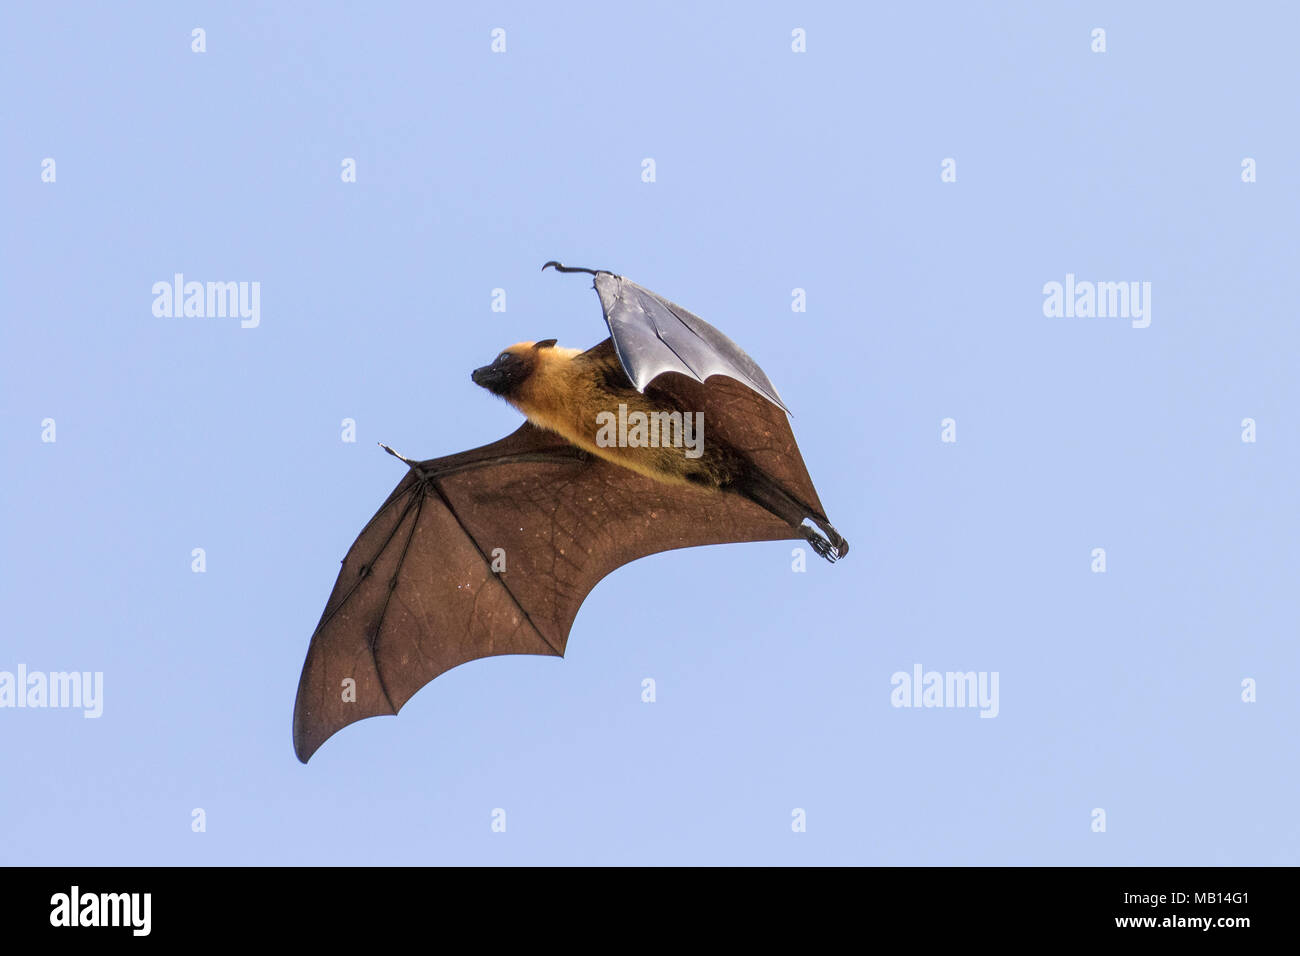 Seychelles Fruit Bat, otherwise known as Seychelles Flying Fox (Pteropus seychellensis), in flight, Silhouette Island, Seychelles - Stock Image